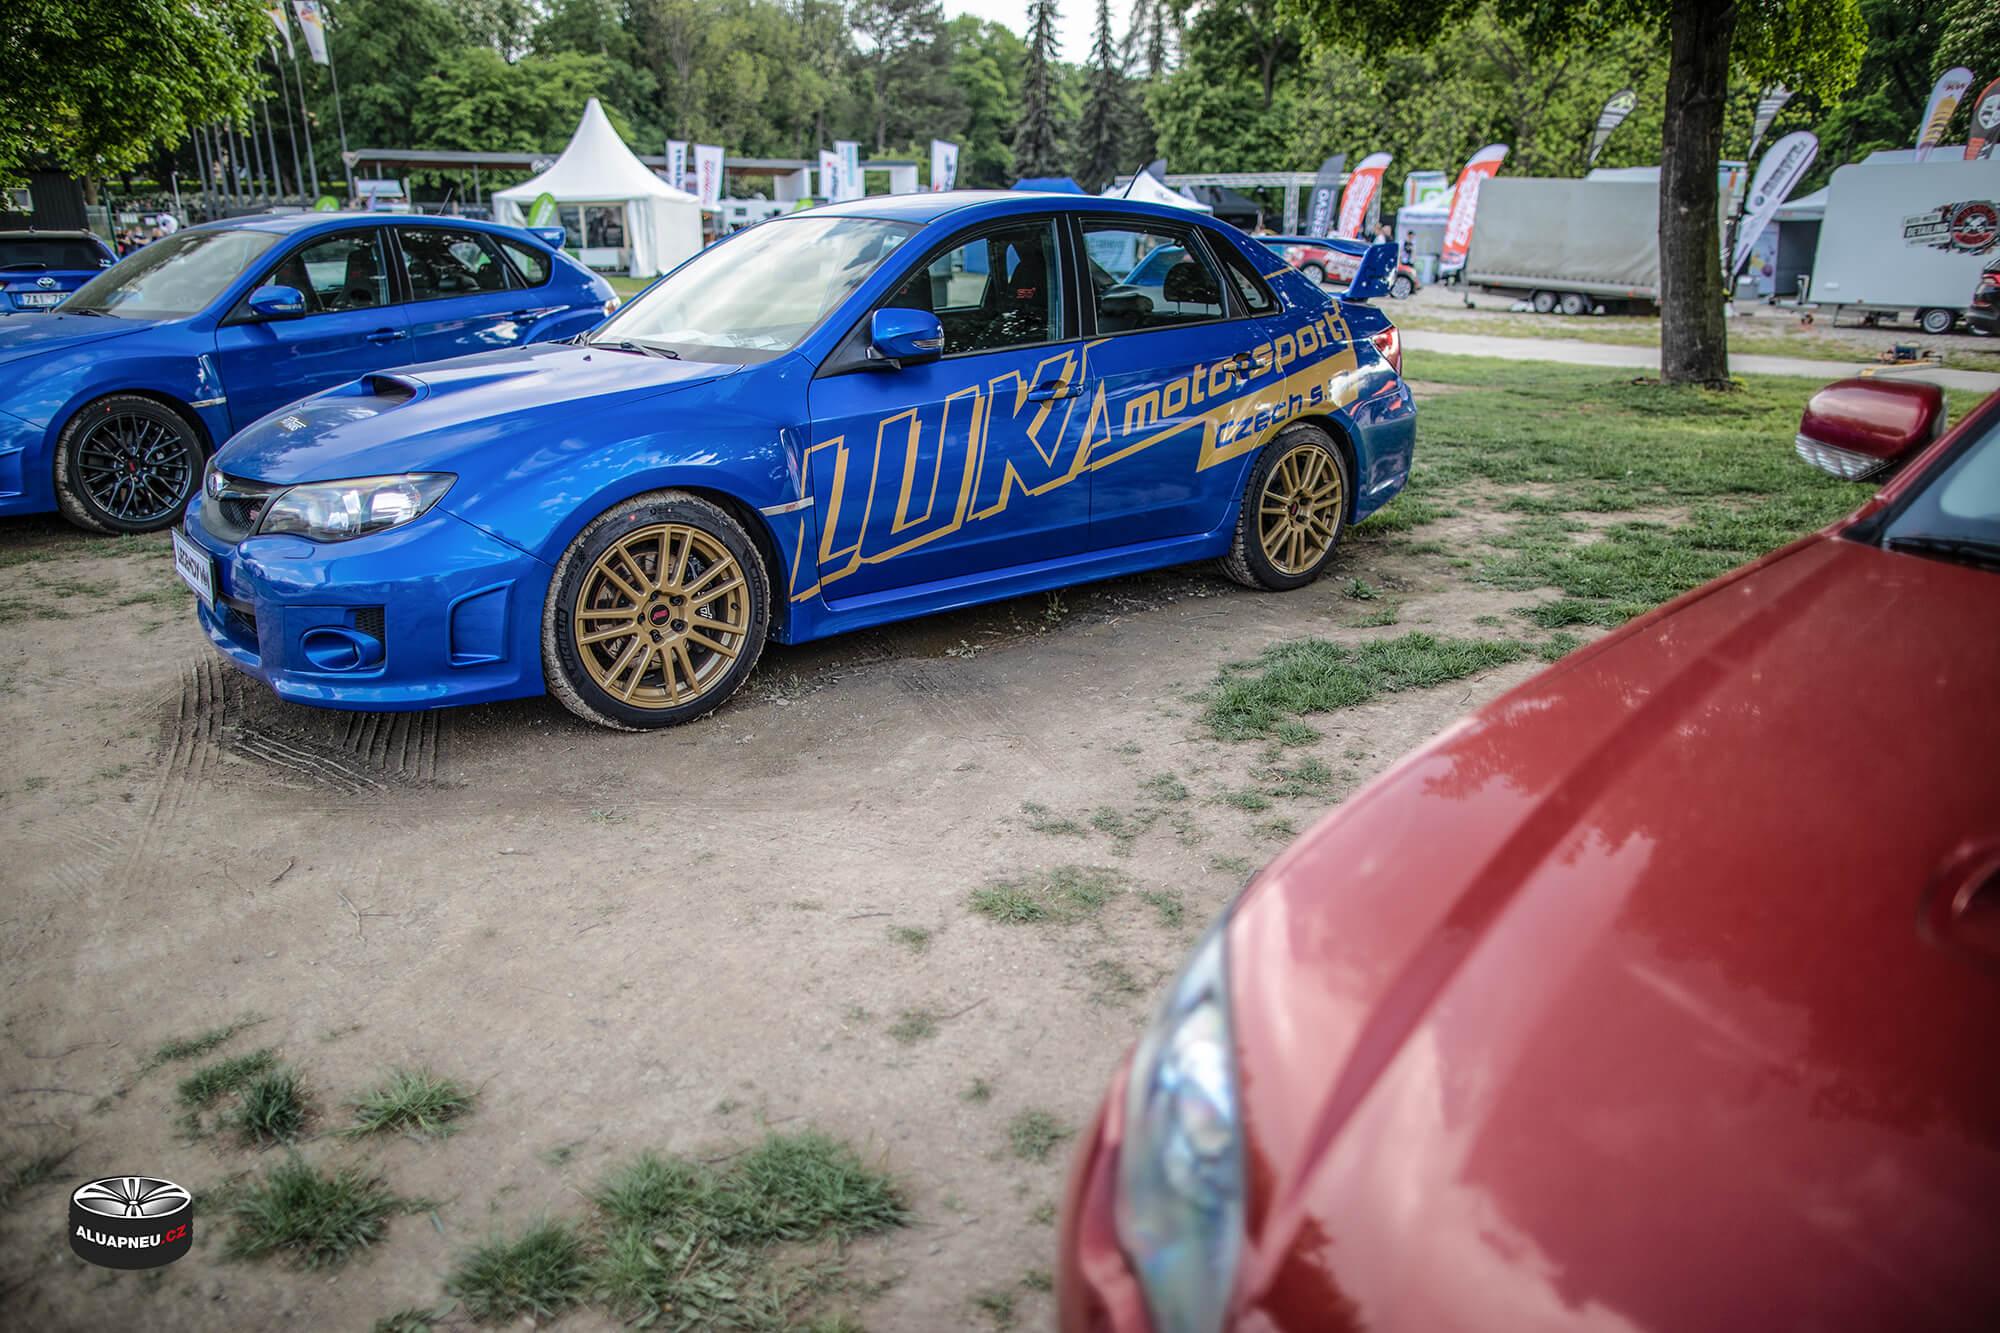 Litá kola Subaru Impreza - originální zlaté alu disky STI - Automobilové Legendy 2019 - www.aluapneu.cz